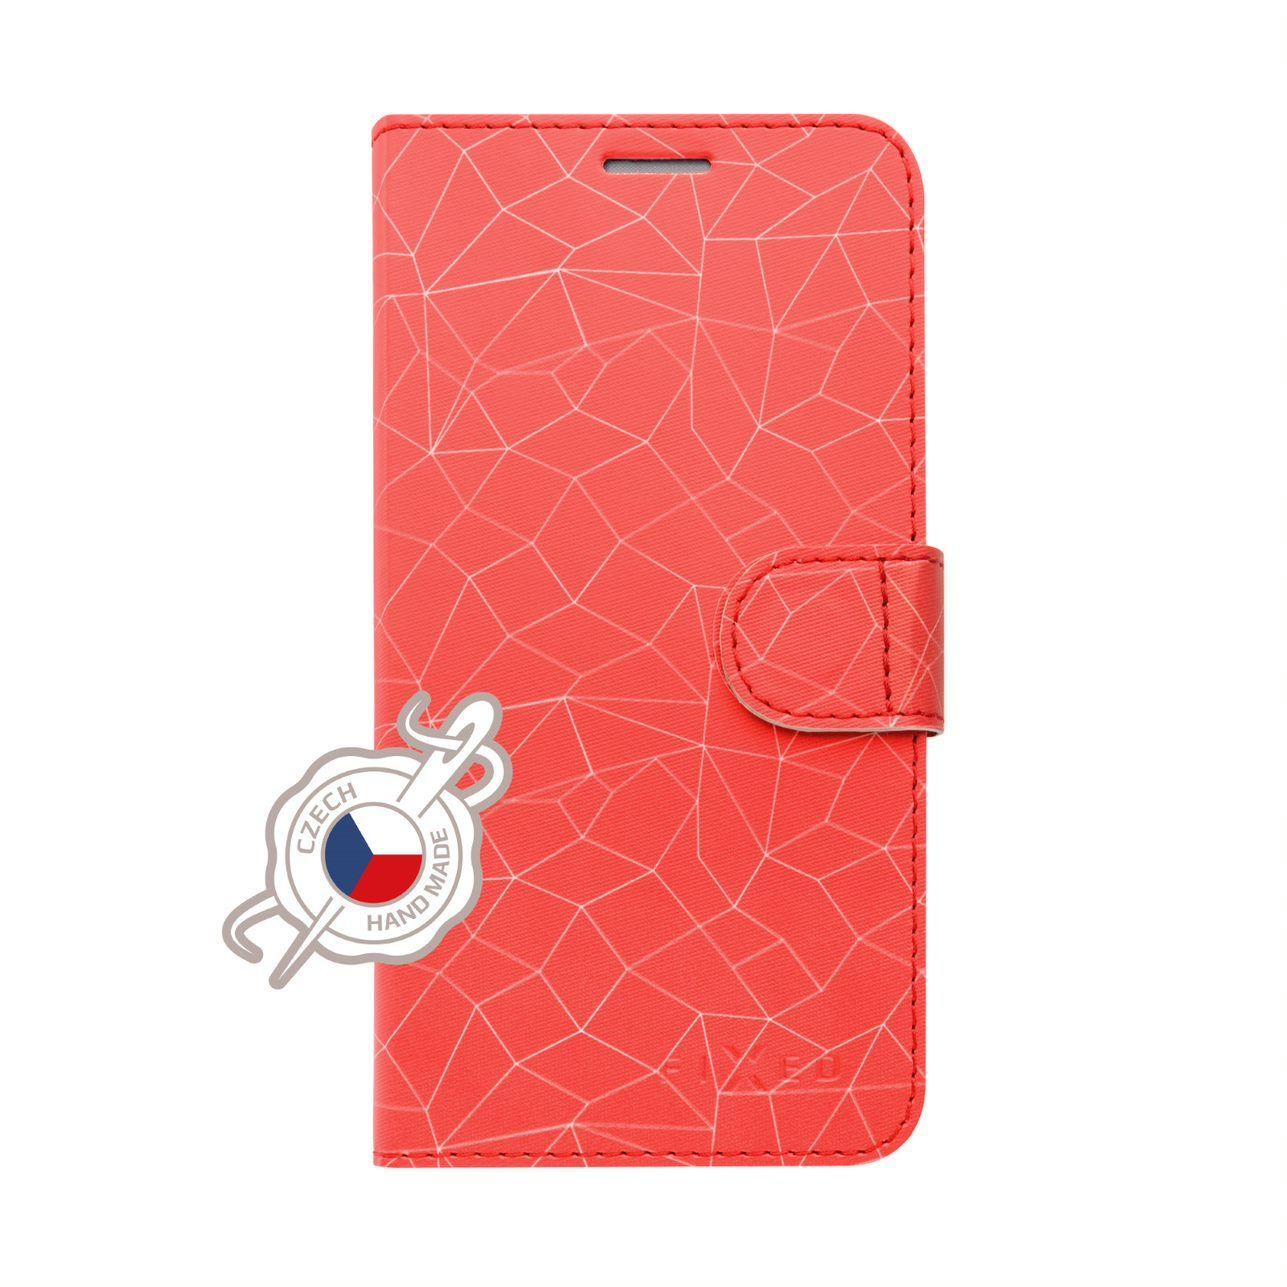 Pouzdro typu kniha FIXED FIT pro Huawei Y9 (2019), motiv Red Mesh